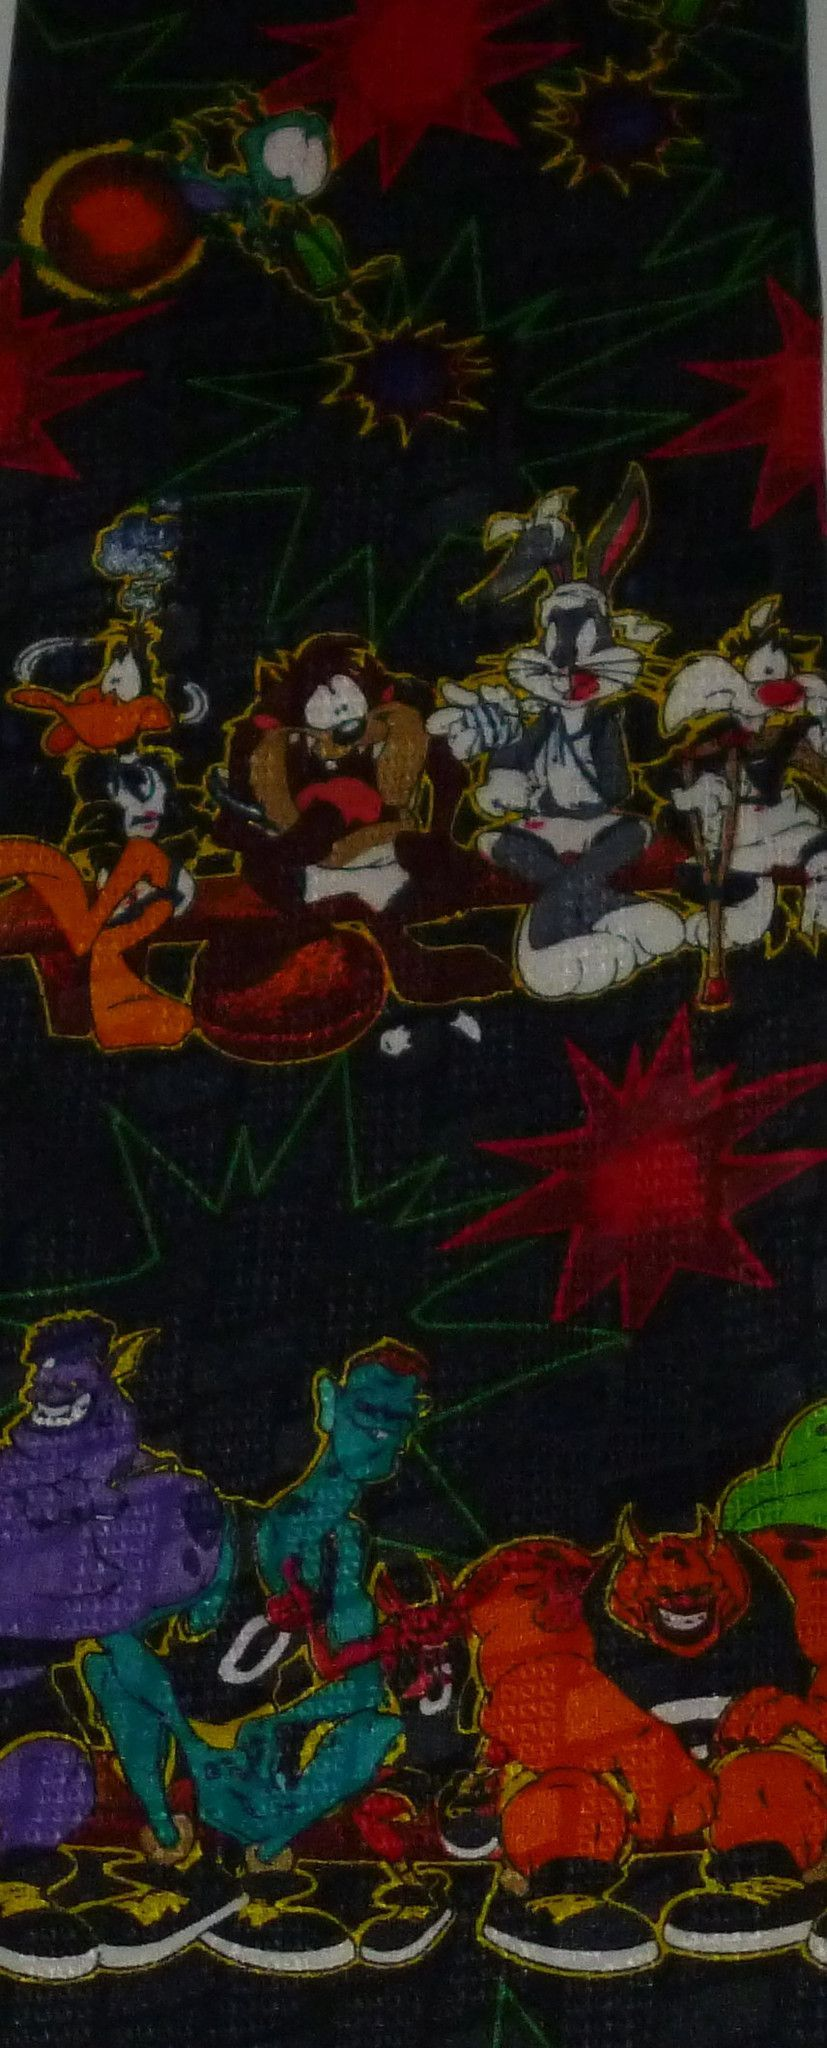 Tunes Space Jam Bugs Bunny Sylvester Daffy Duck Taz Tie # Taz Muebles De Oficina